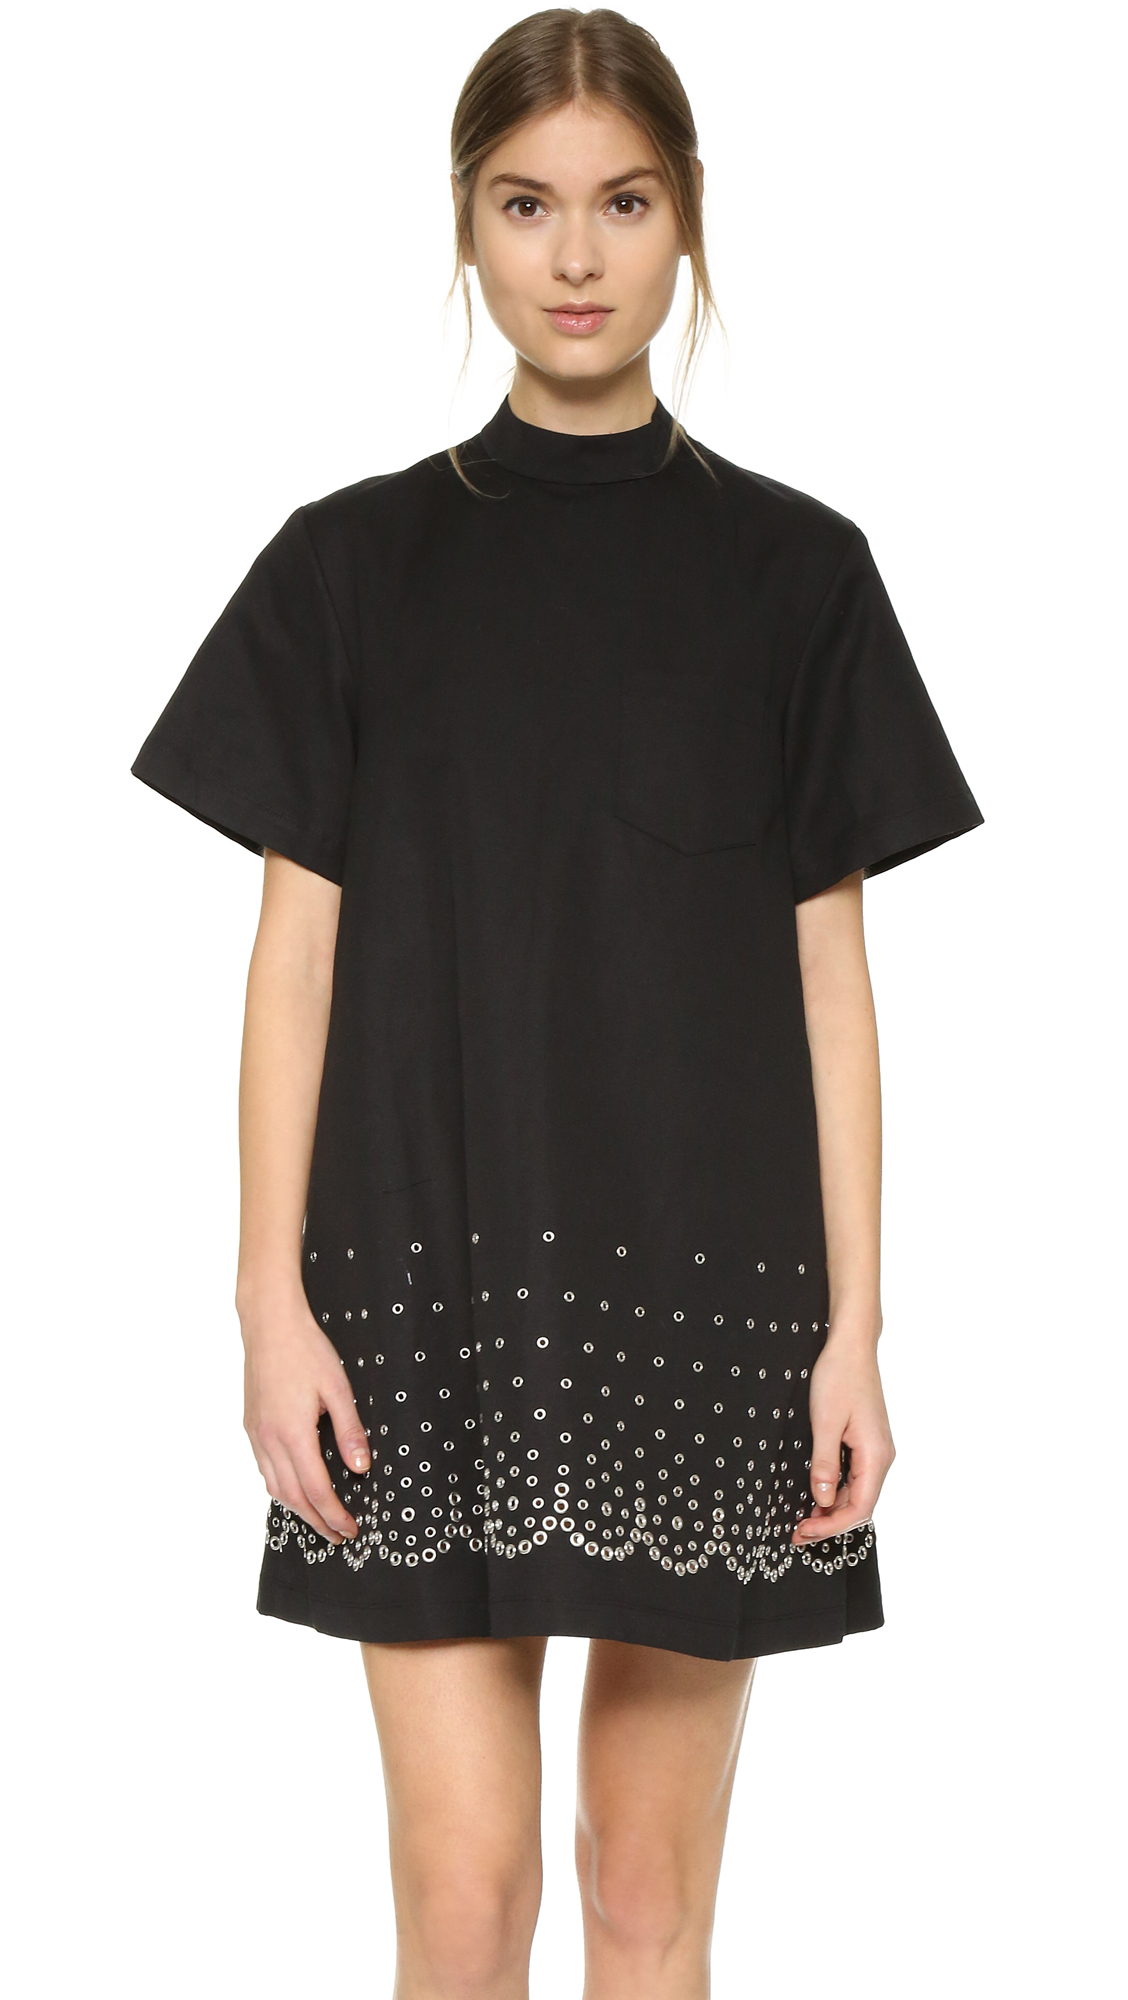 alexander wang mock neck t shirt dress in black lyst